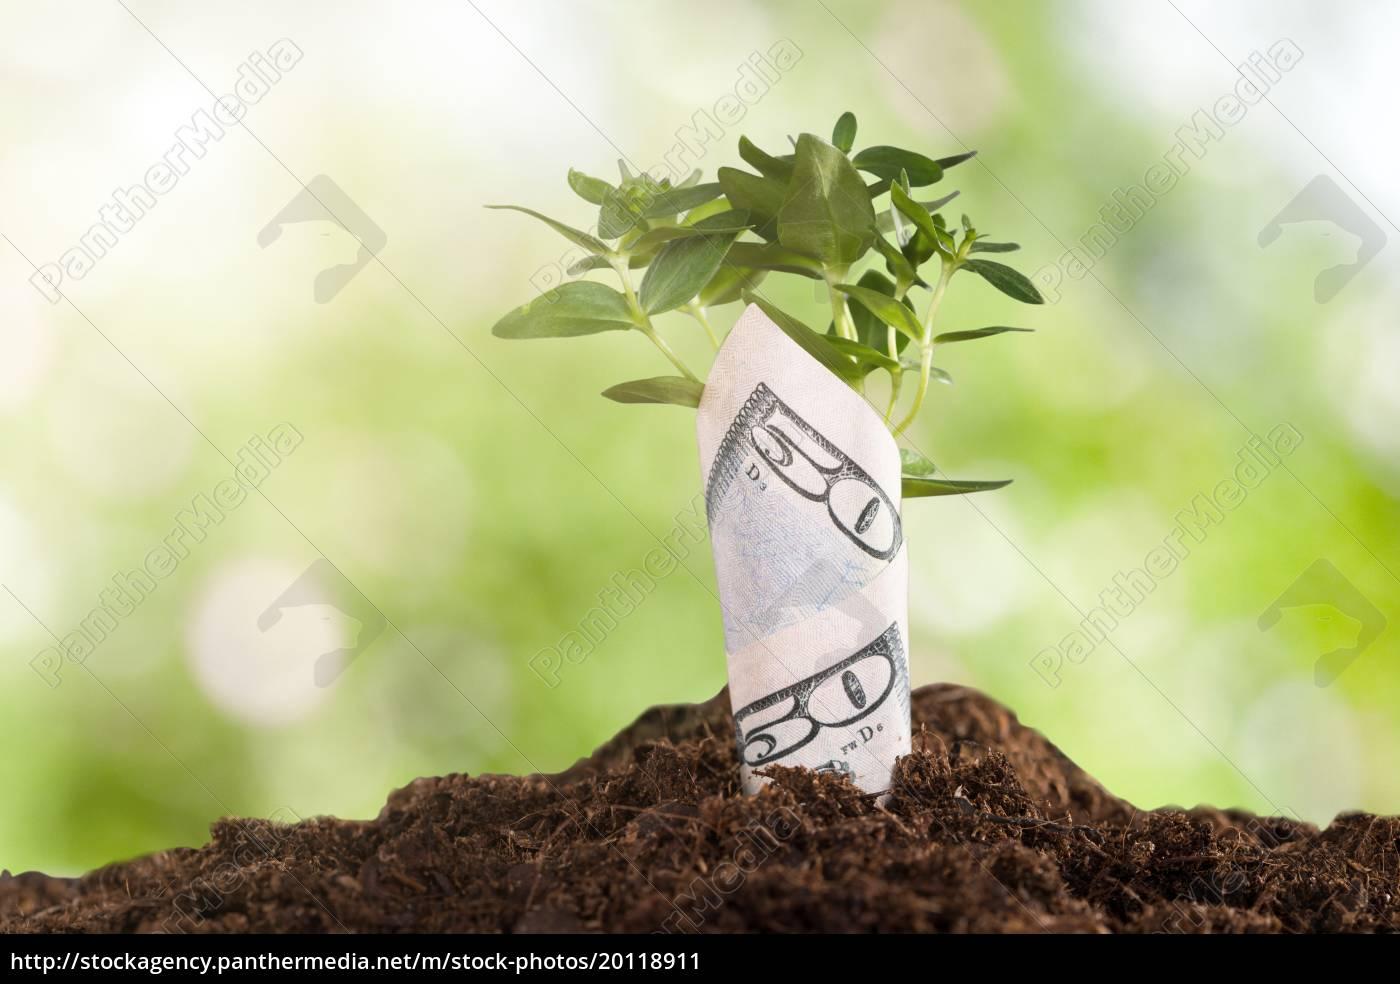 sapling, wrapped, in, dollar, bill - 20118911